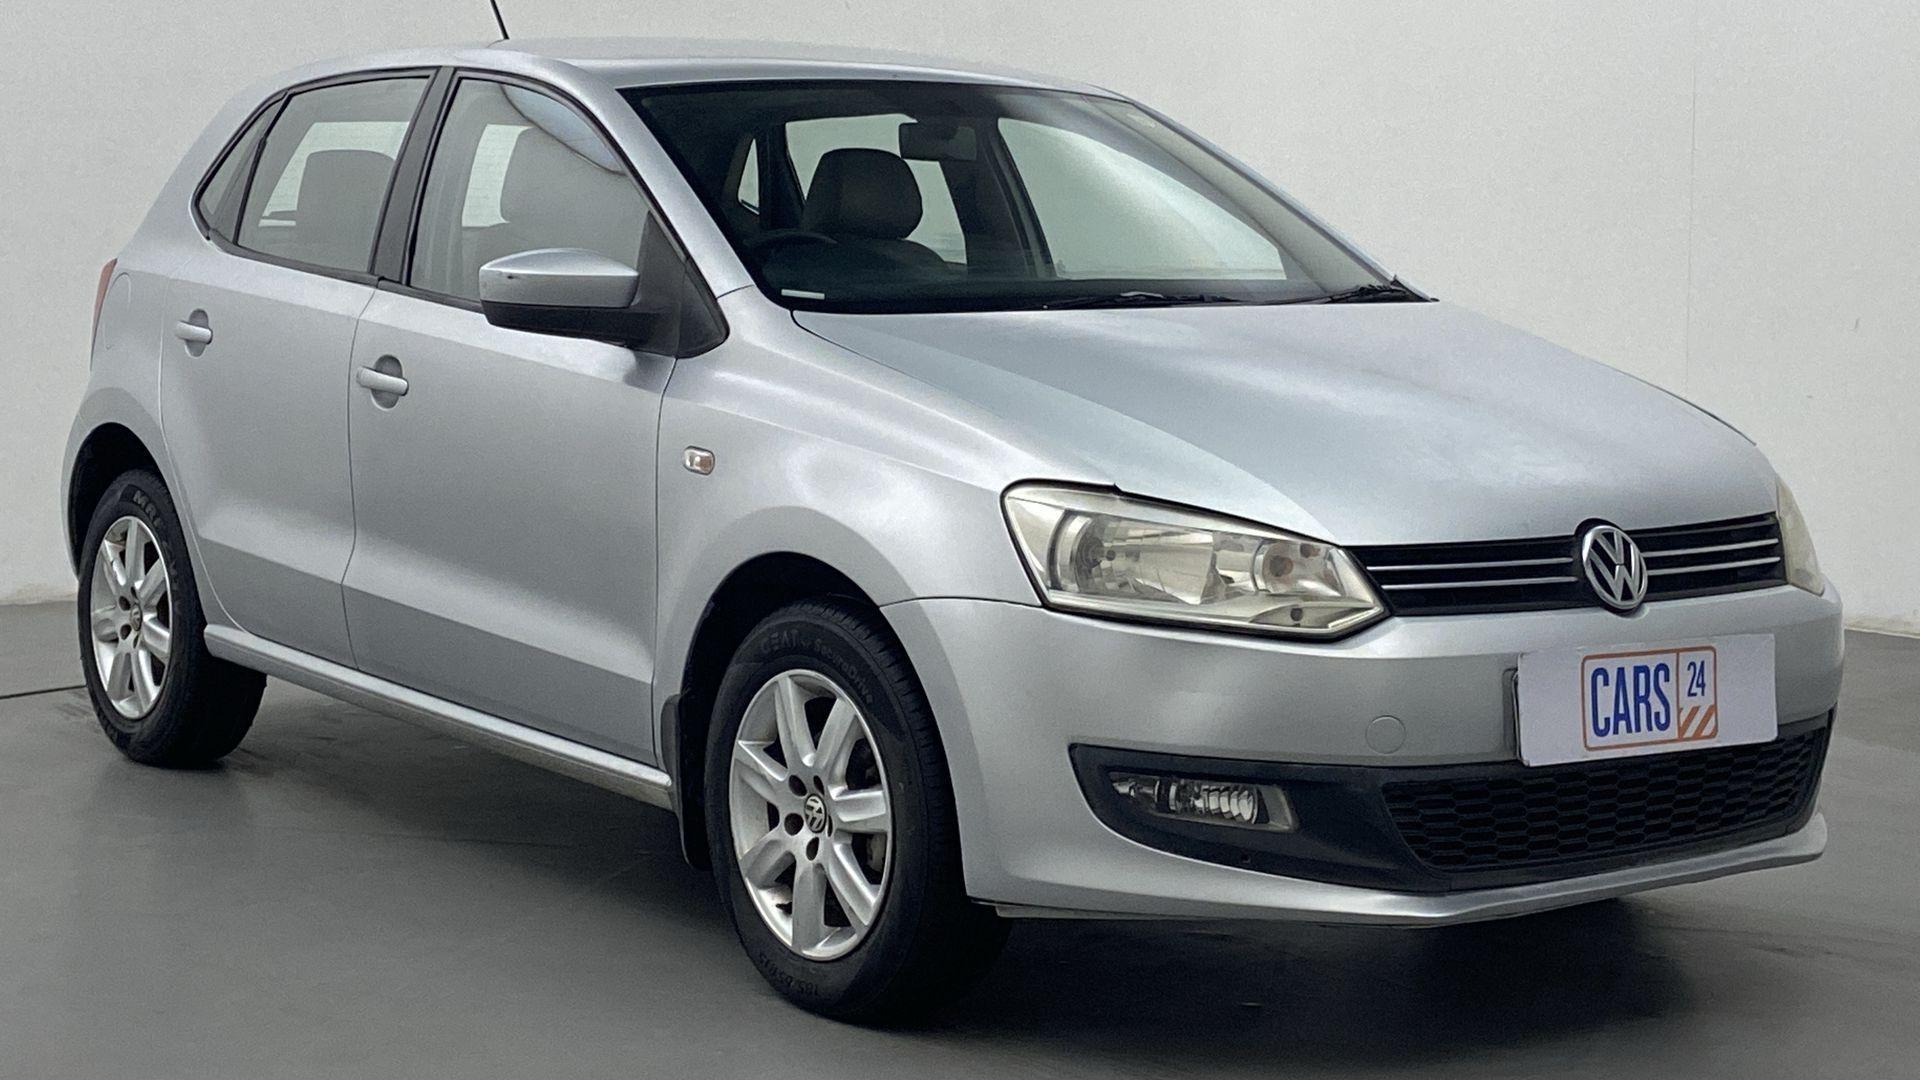 2012 Volkswagen Polo HIGHLINE1.2L DIESEL